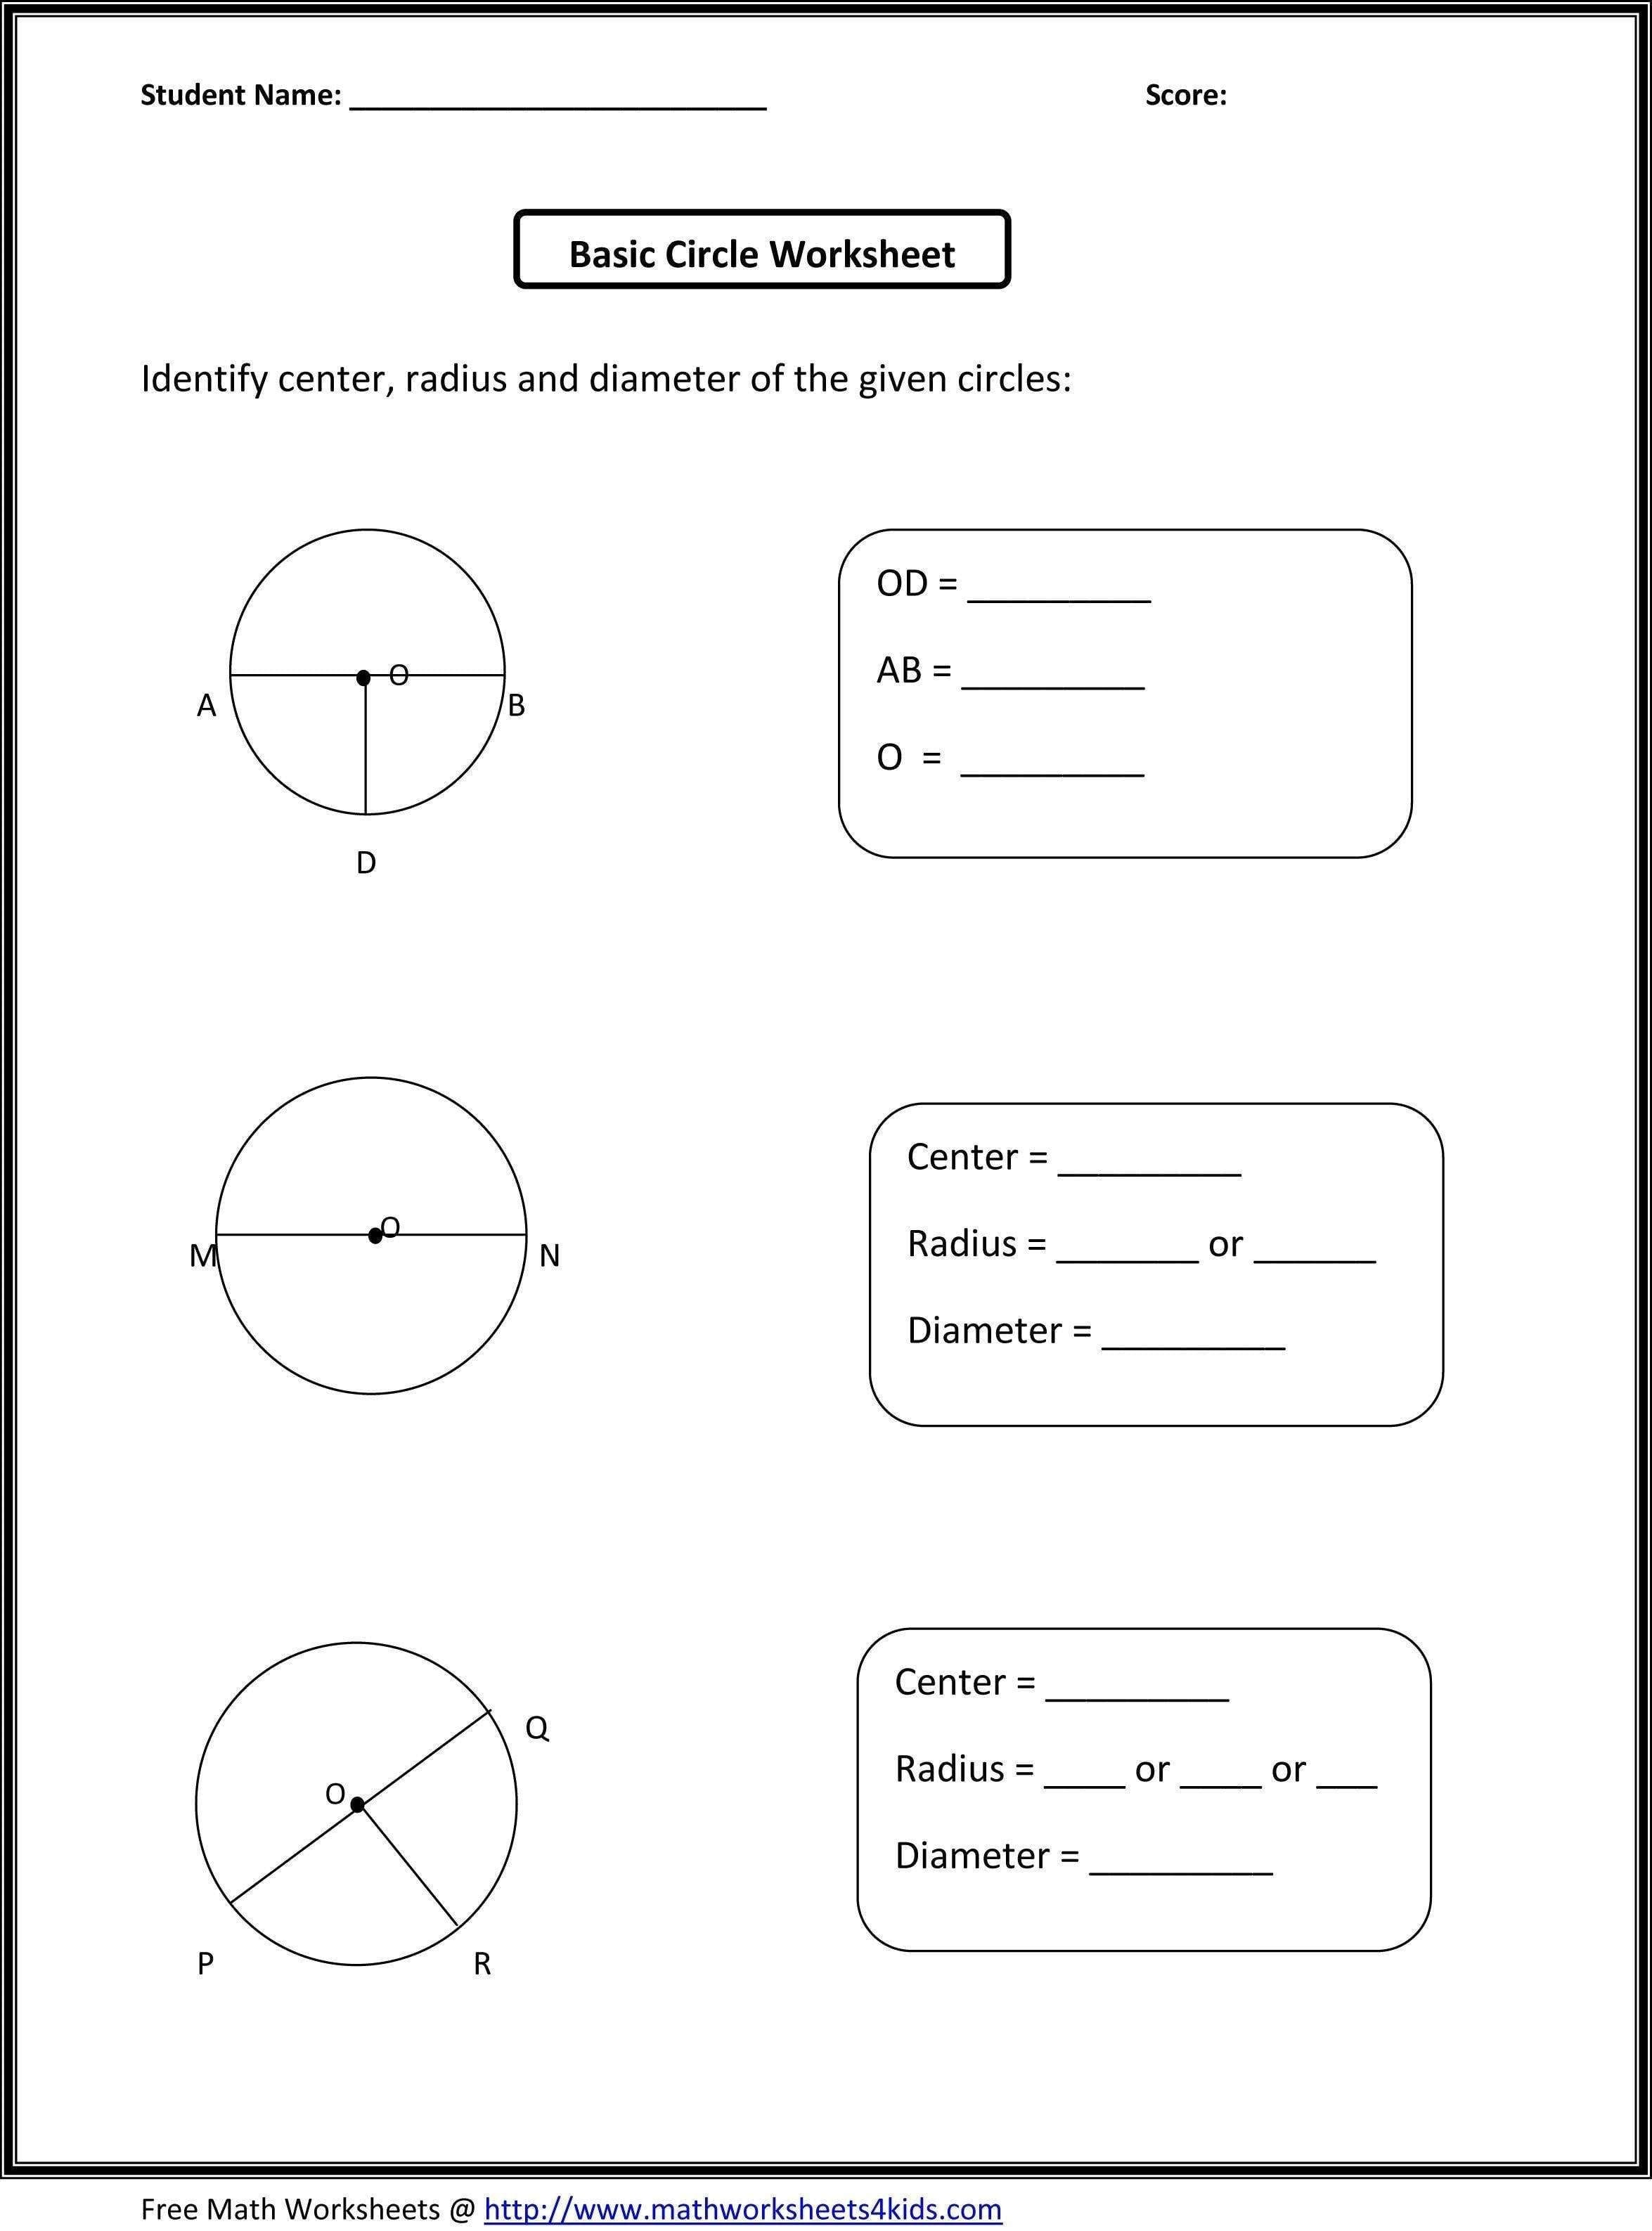 Spanish Clock Worksheet Answers